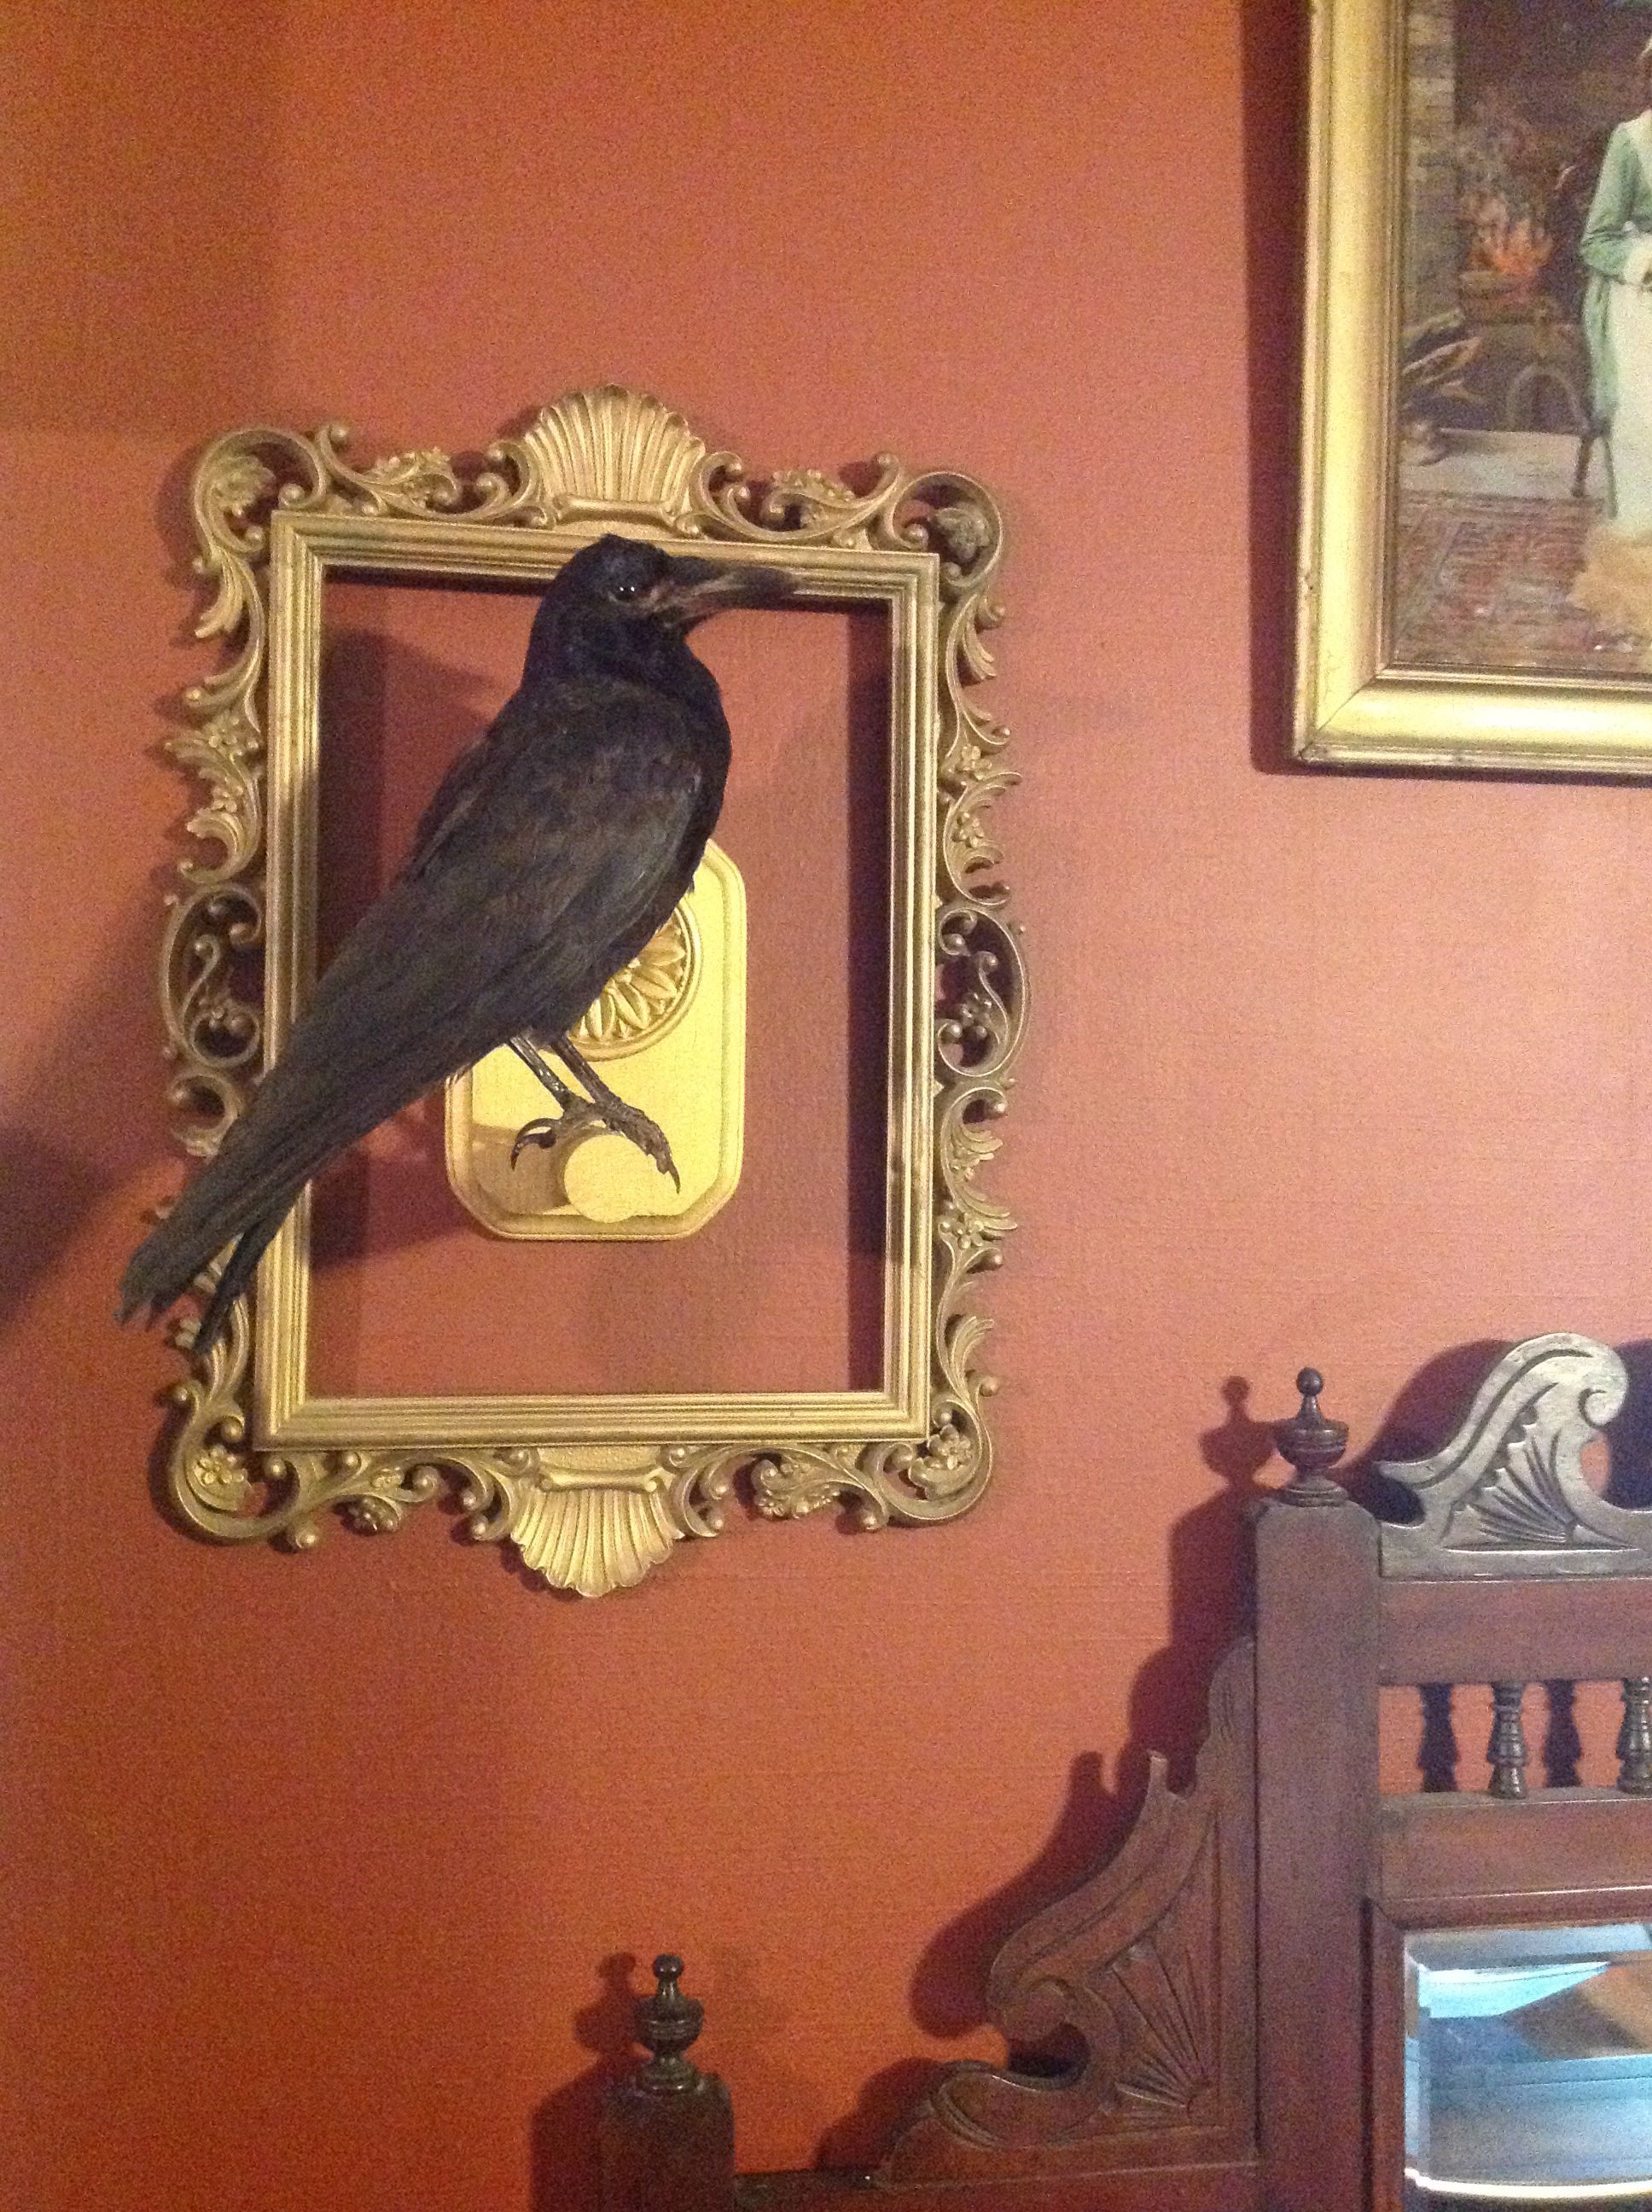 taxidermy crow vintage decor home decor i like pinterest faux taxidermy decorative home decor stu n dumplings